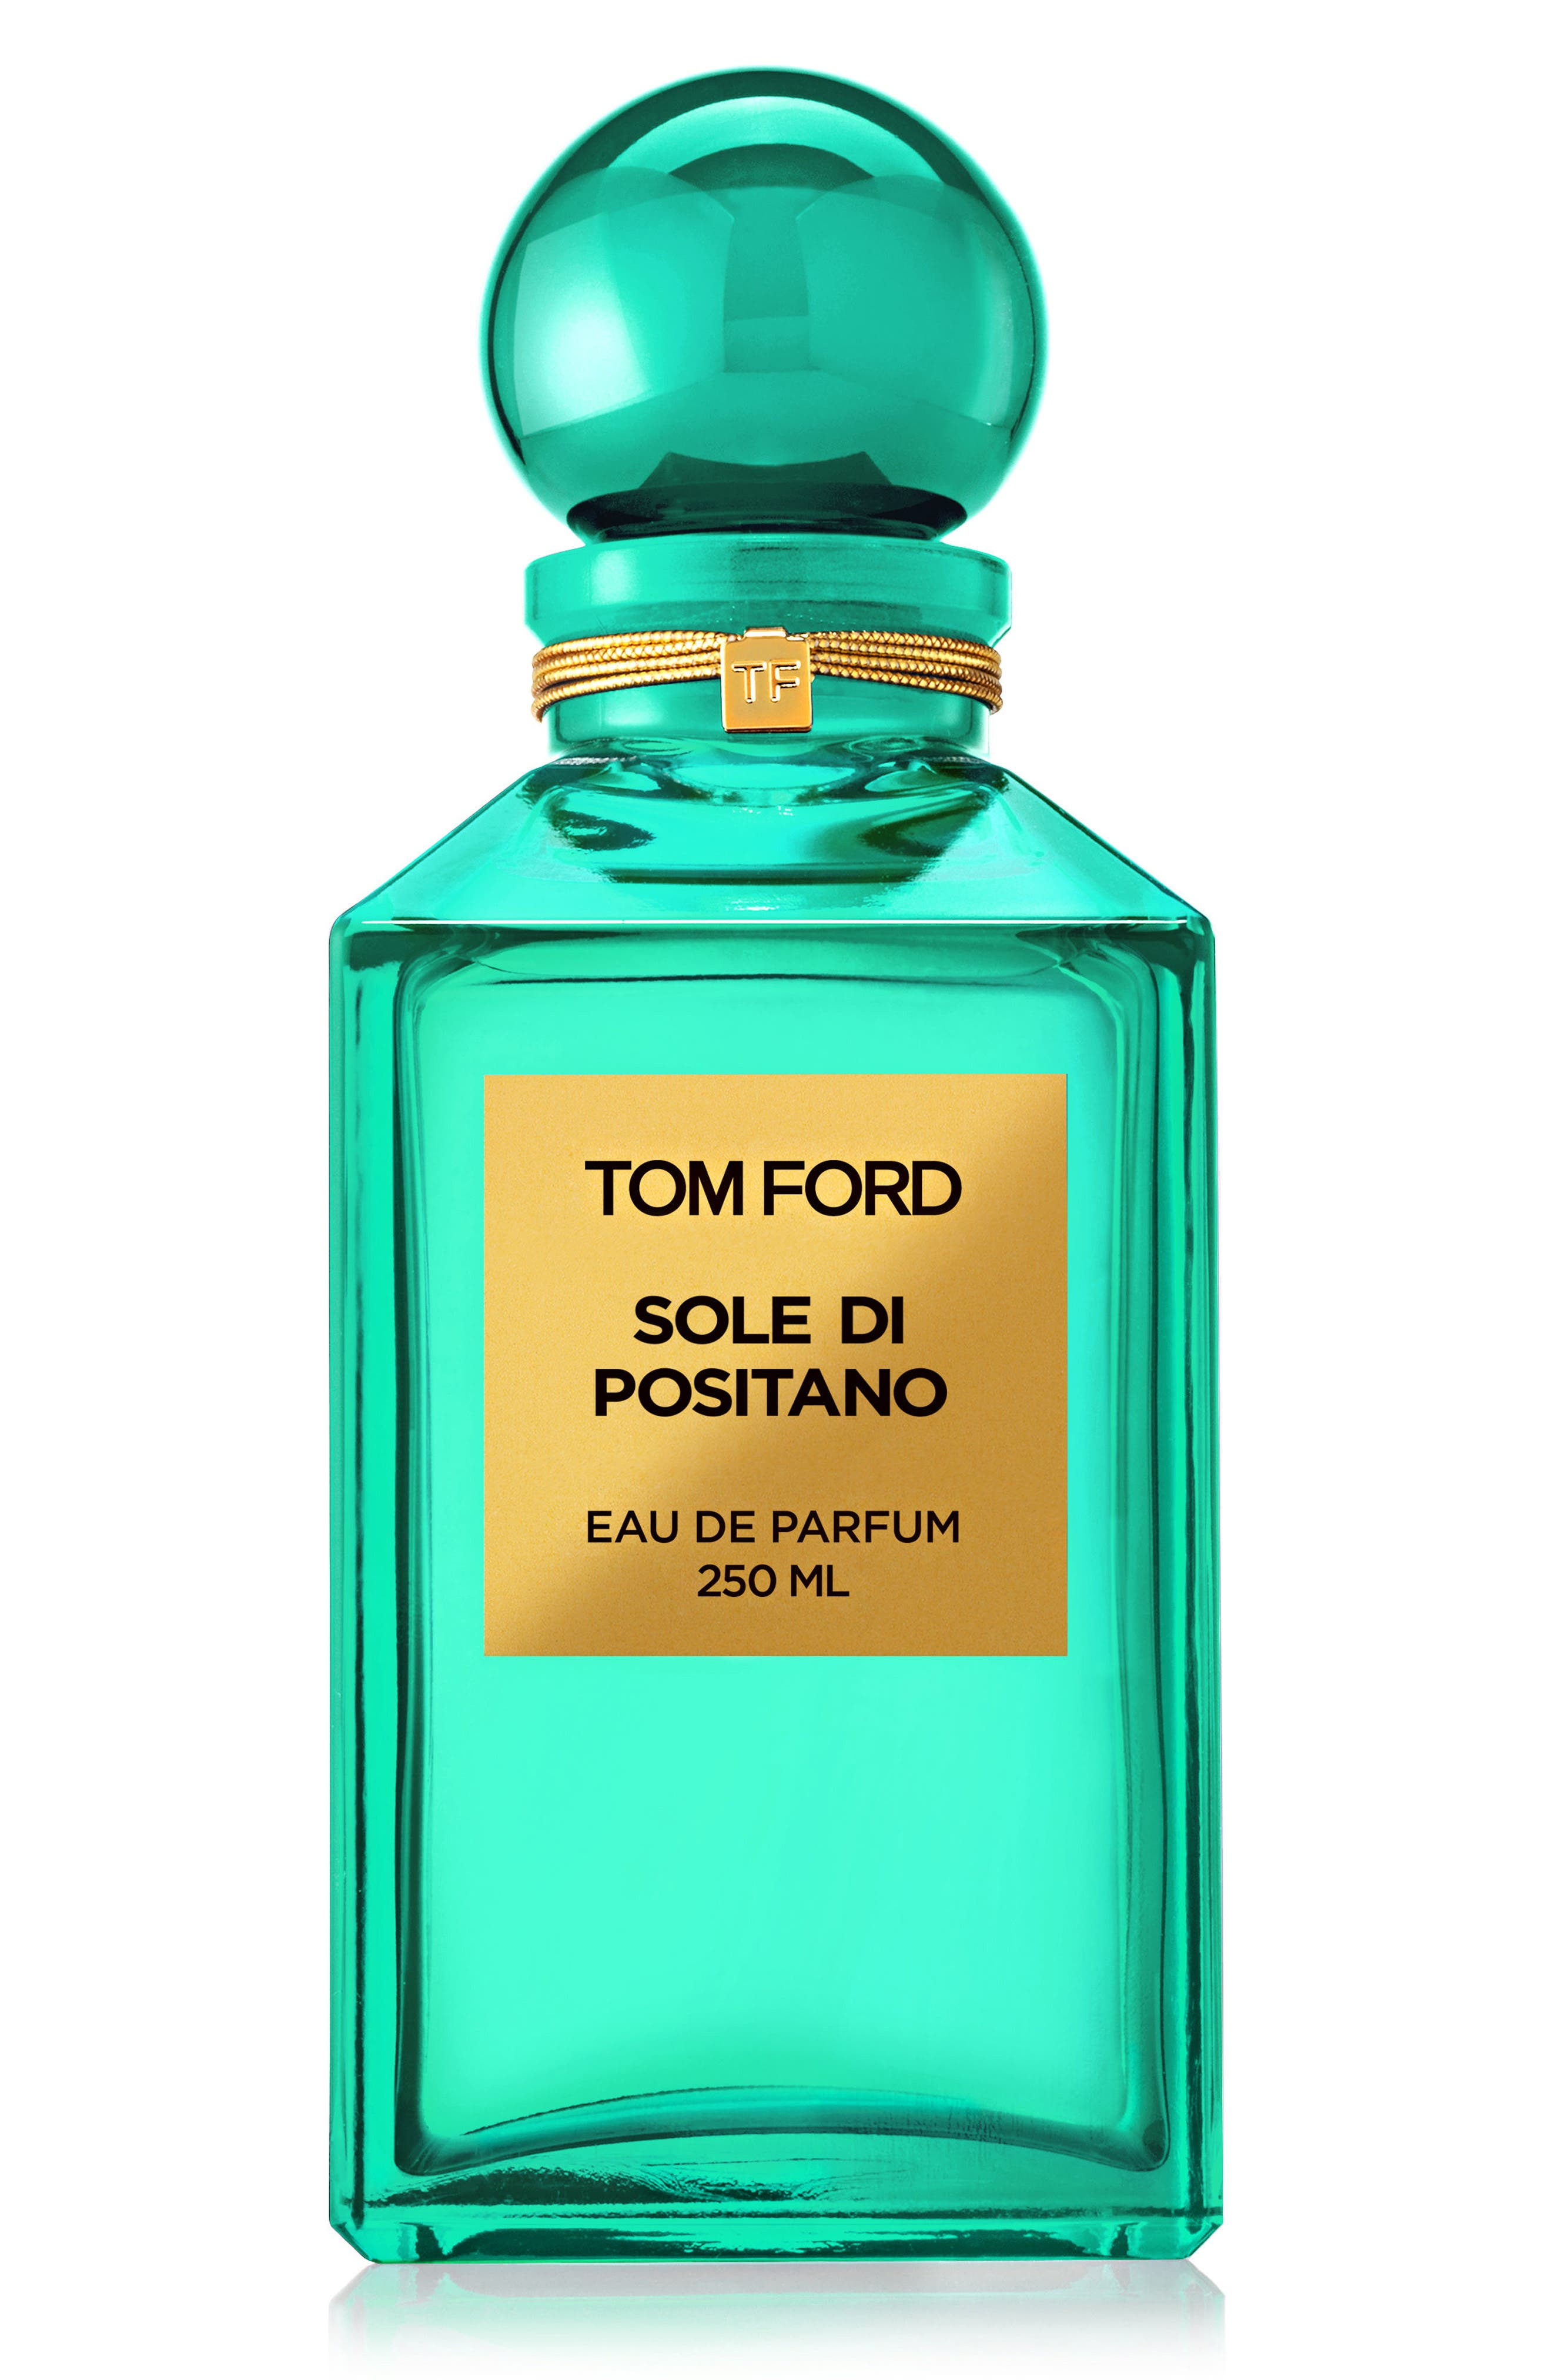 Main Image - Tom Ford Private Blend Sole di Positano Eau de Parfum Decanter